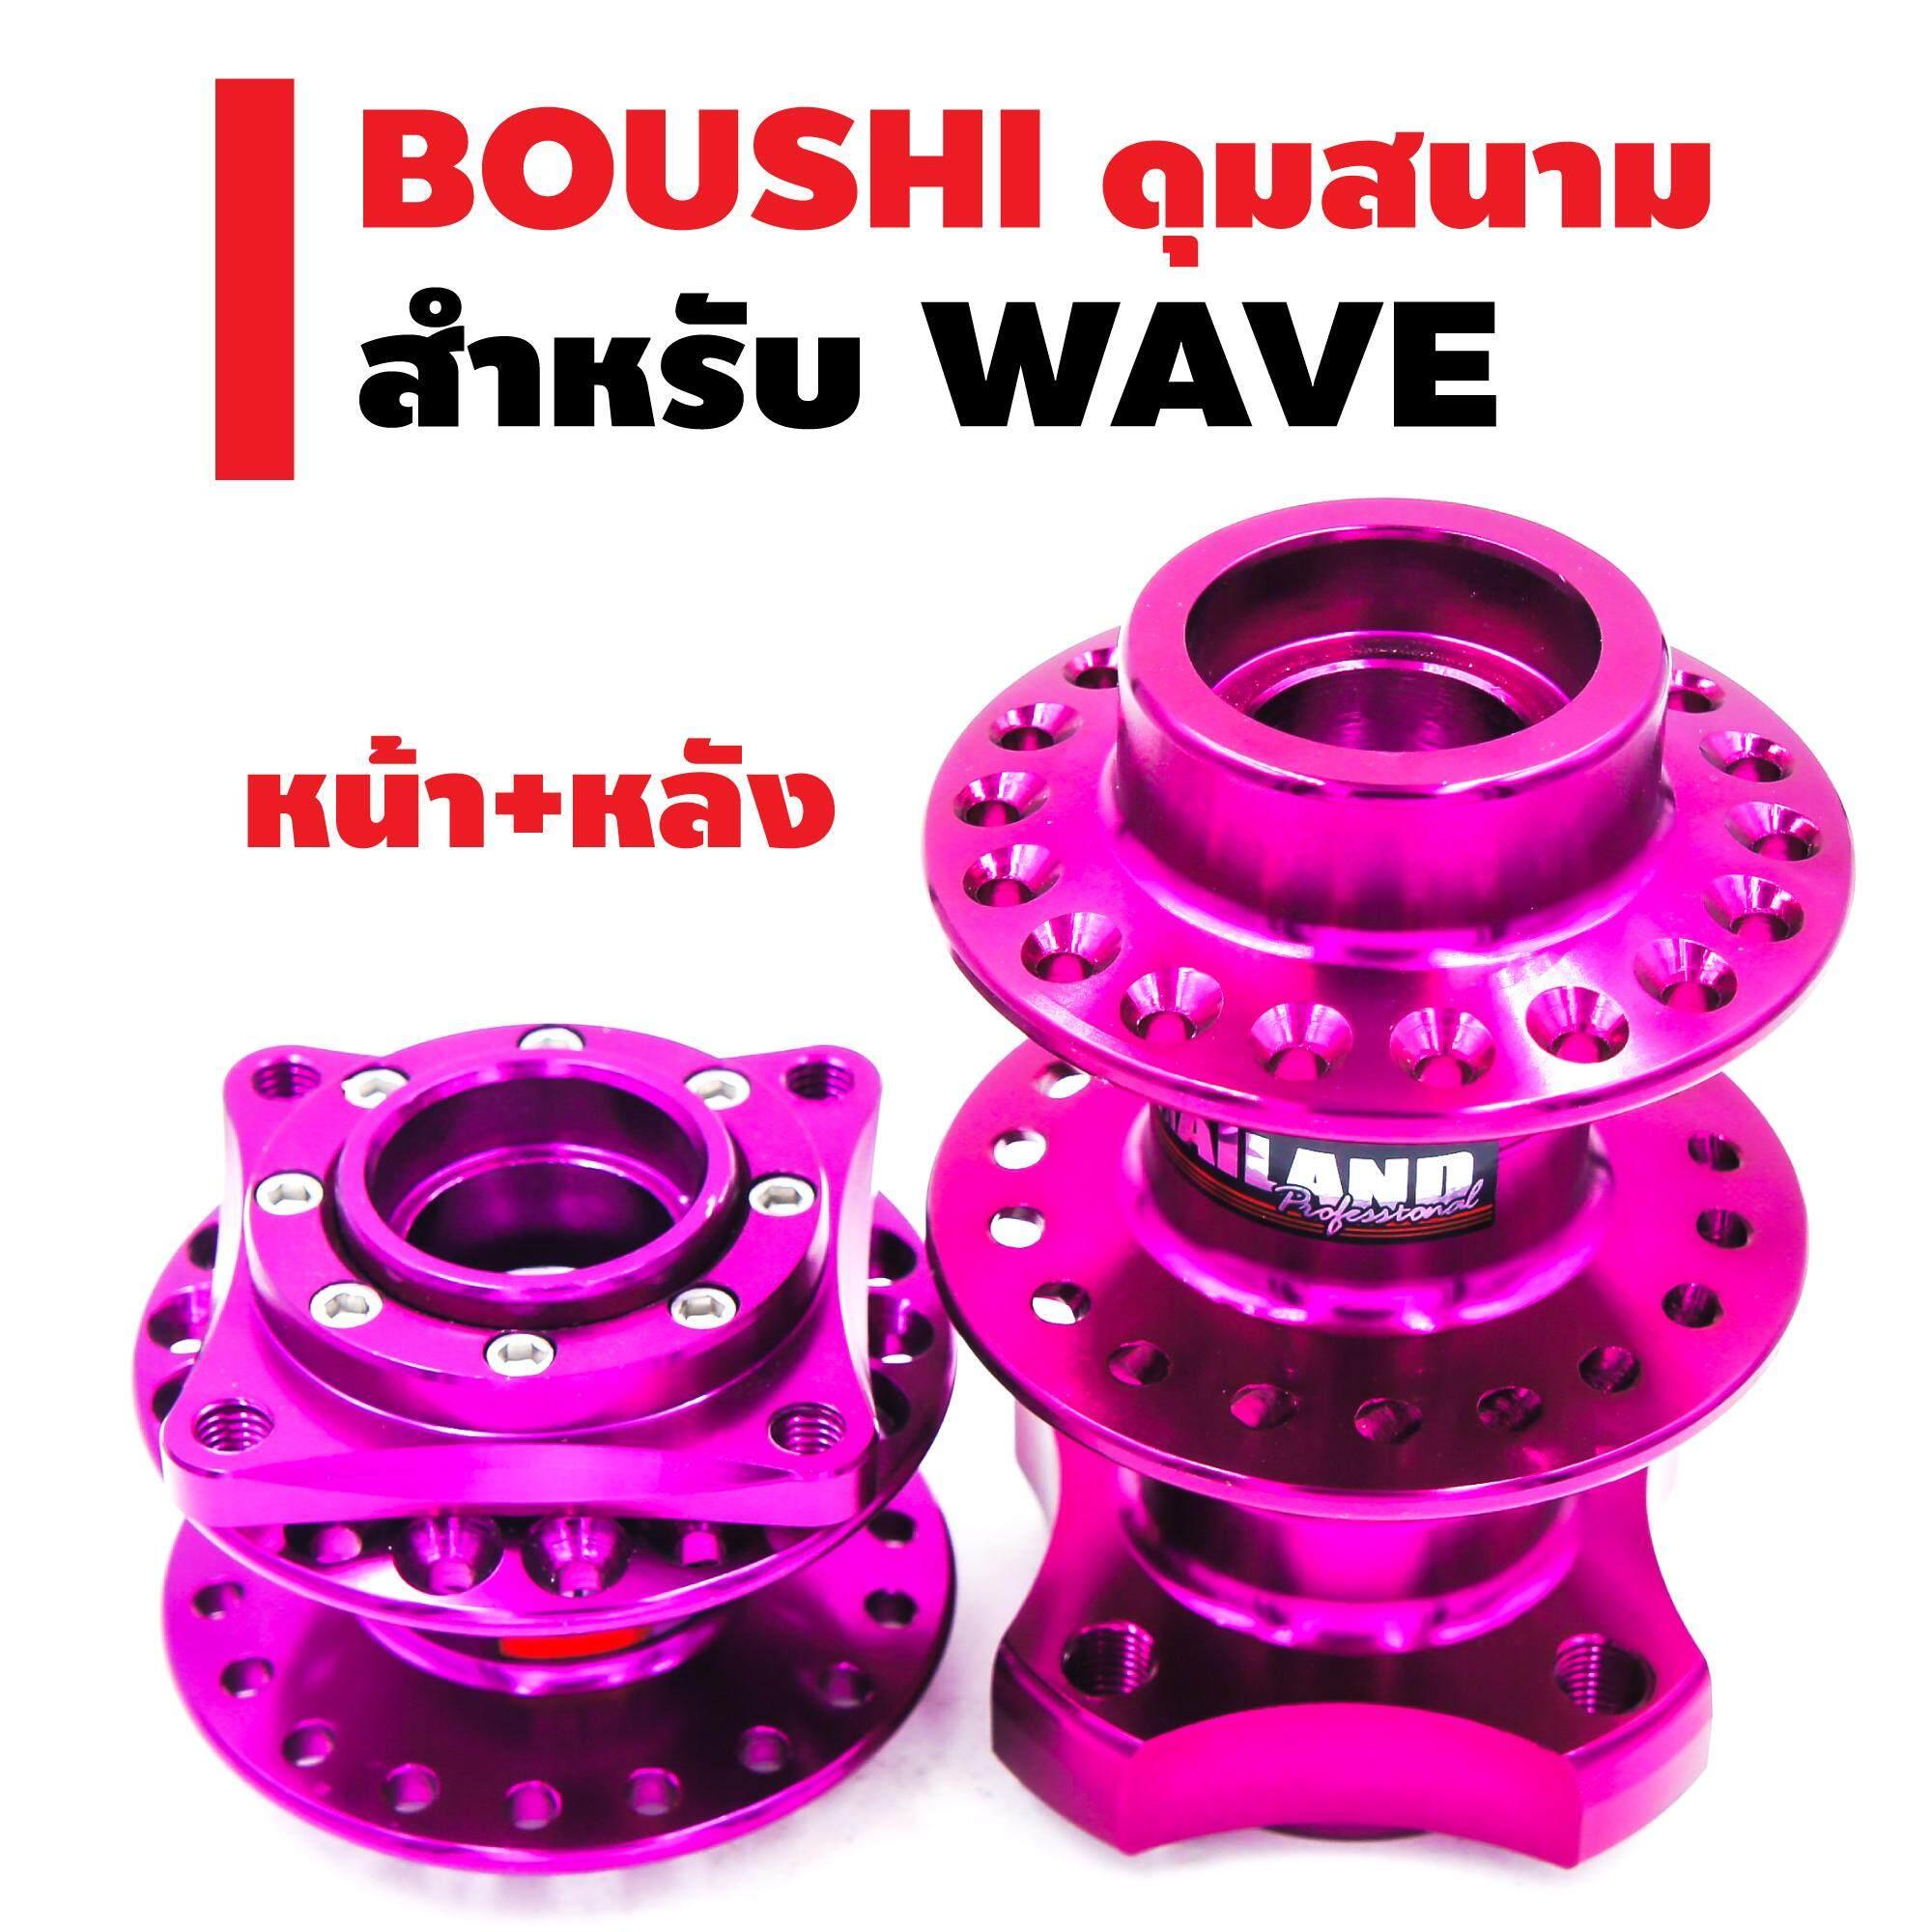 Boushi ดุมสนาม (ย่อ) หน้า+หลัง สำหรับ 4รู Wave สีม่วง By Big Boss Bike.